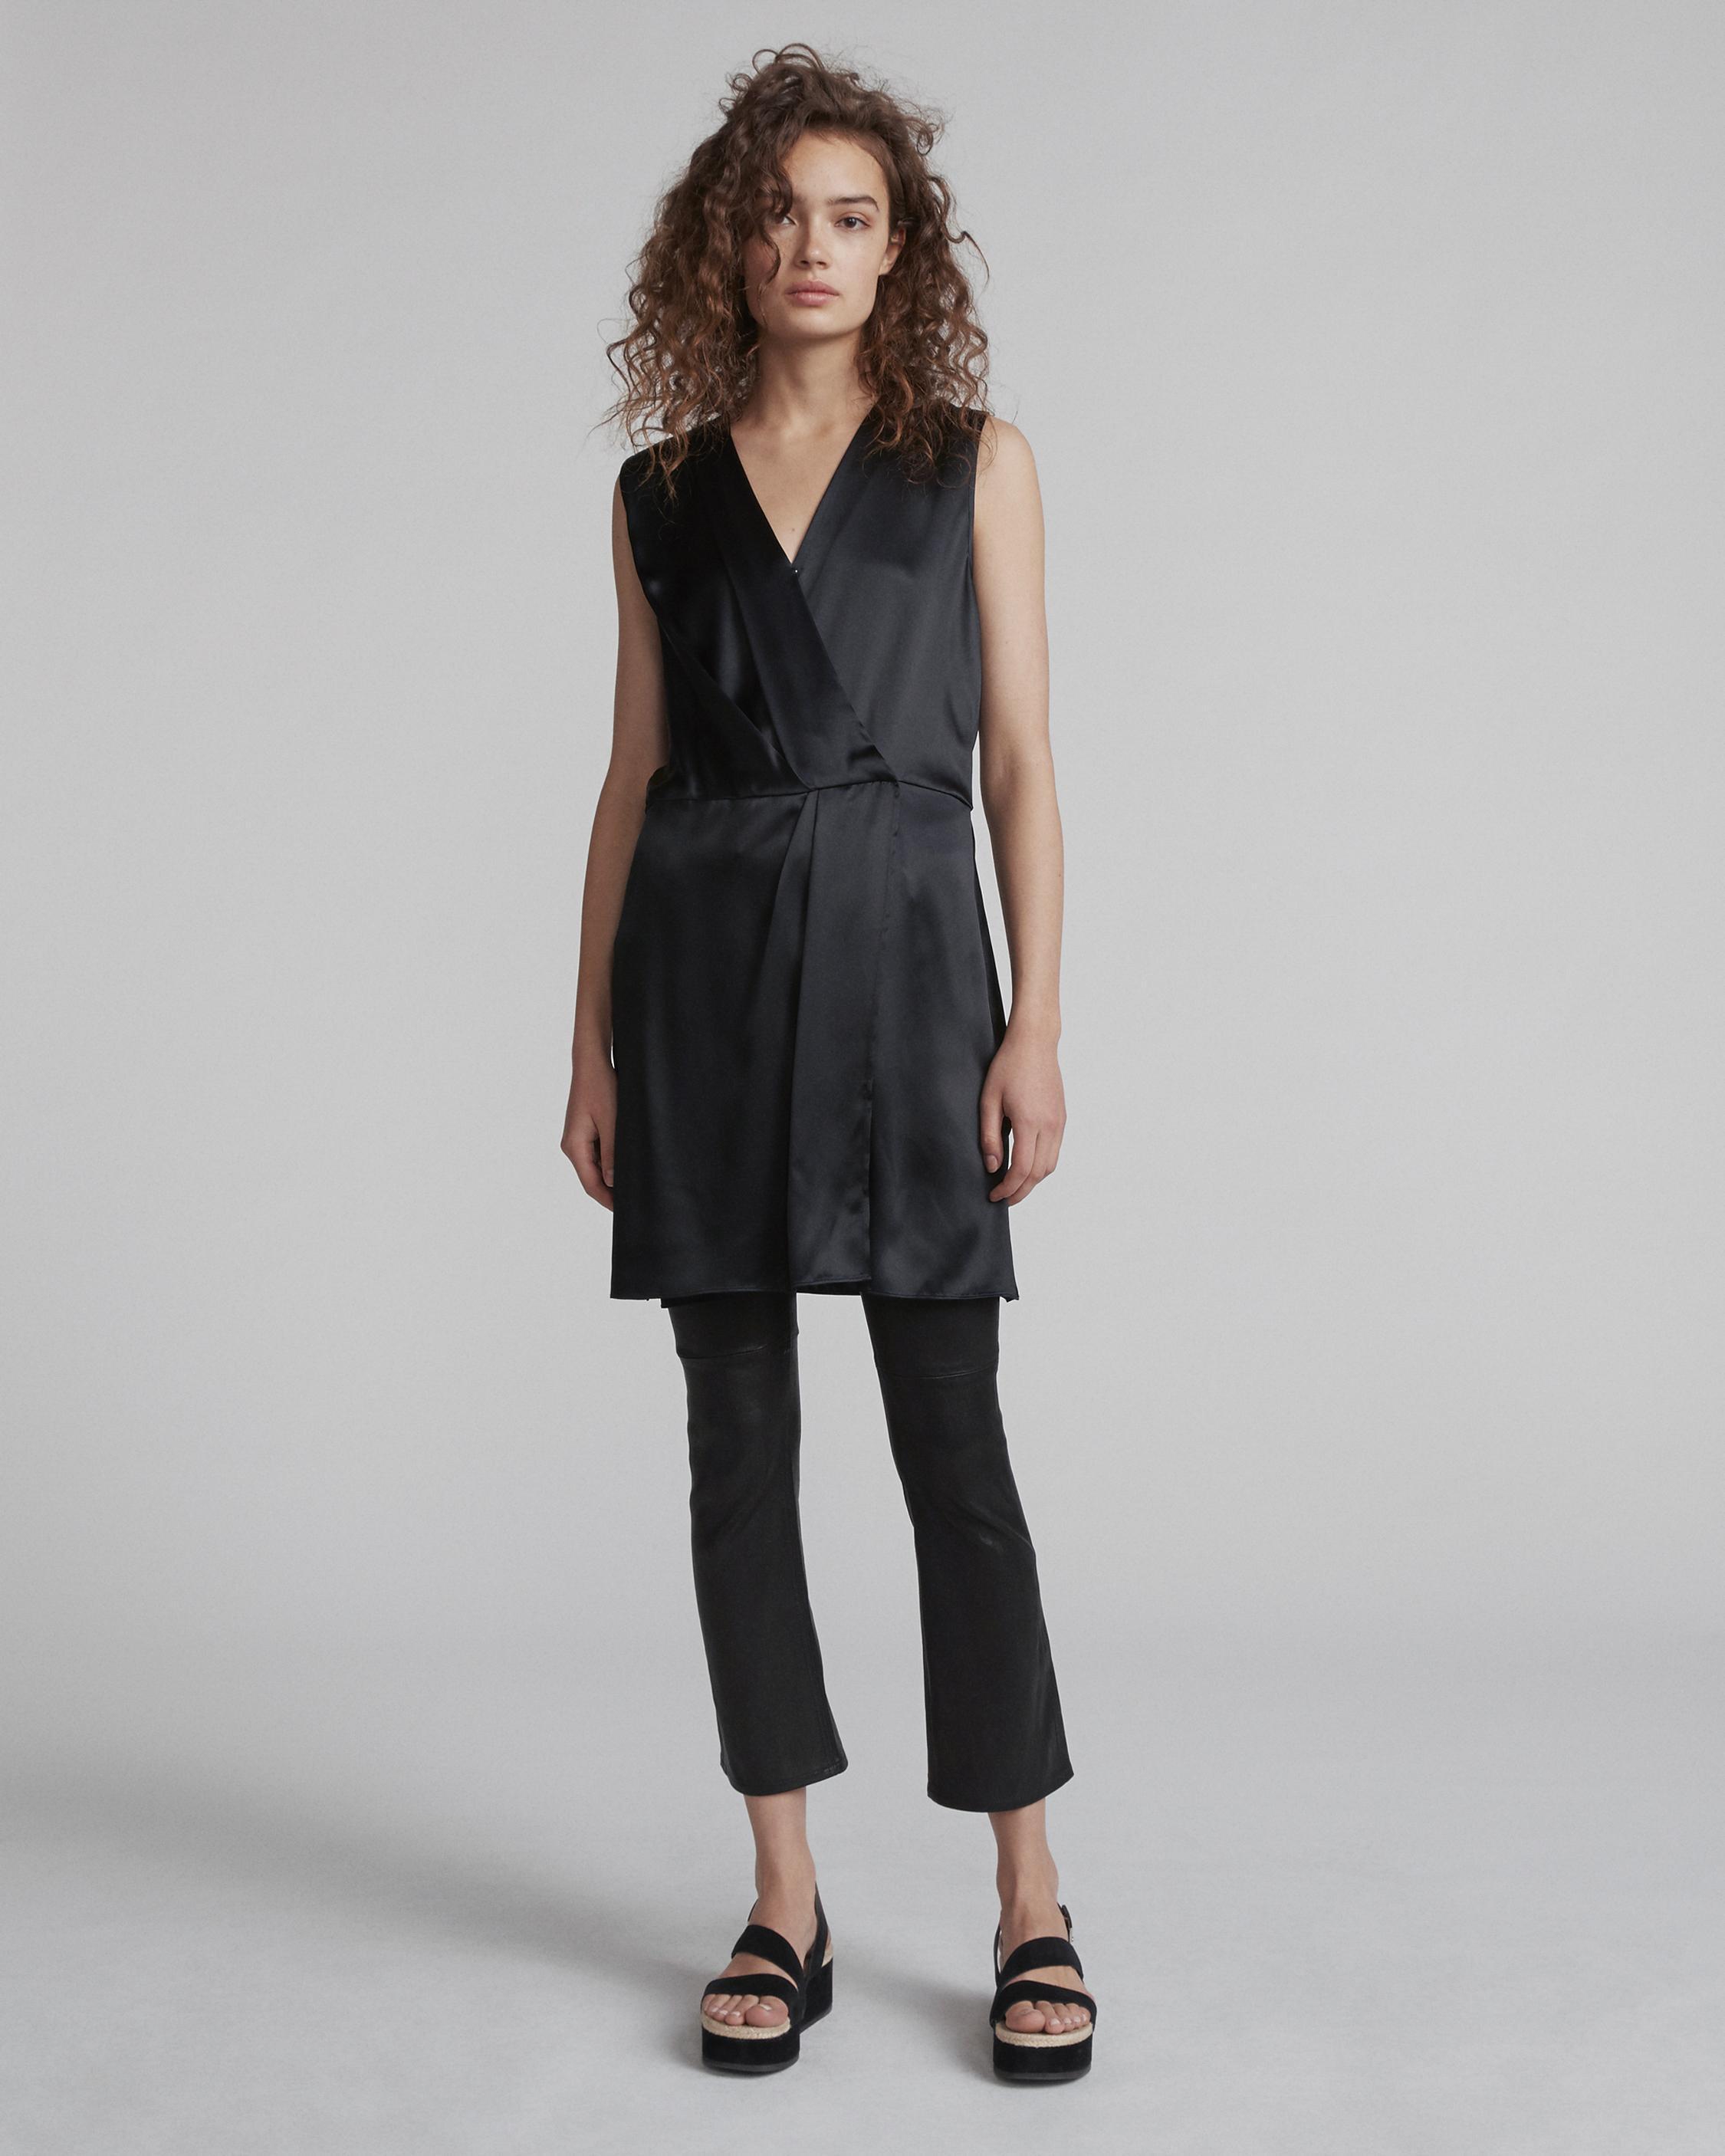 046a8fe823847b Rag & Bone Sleeveless Victor Dress in Black - Lyst